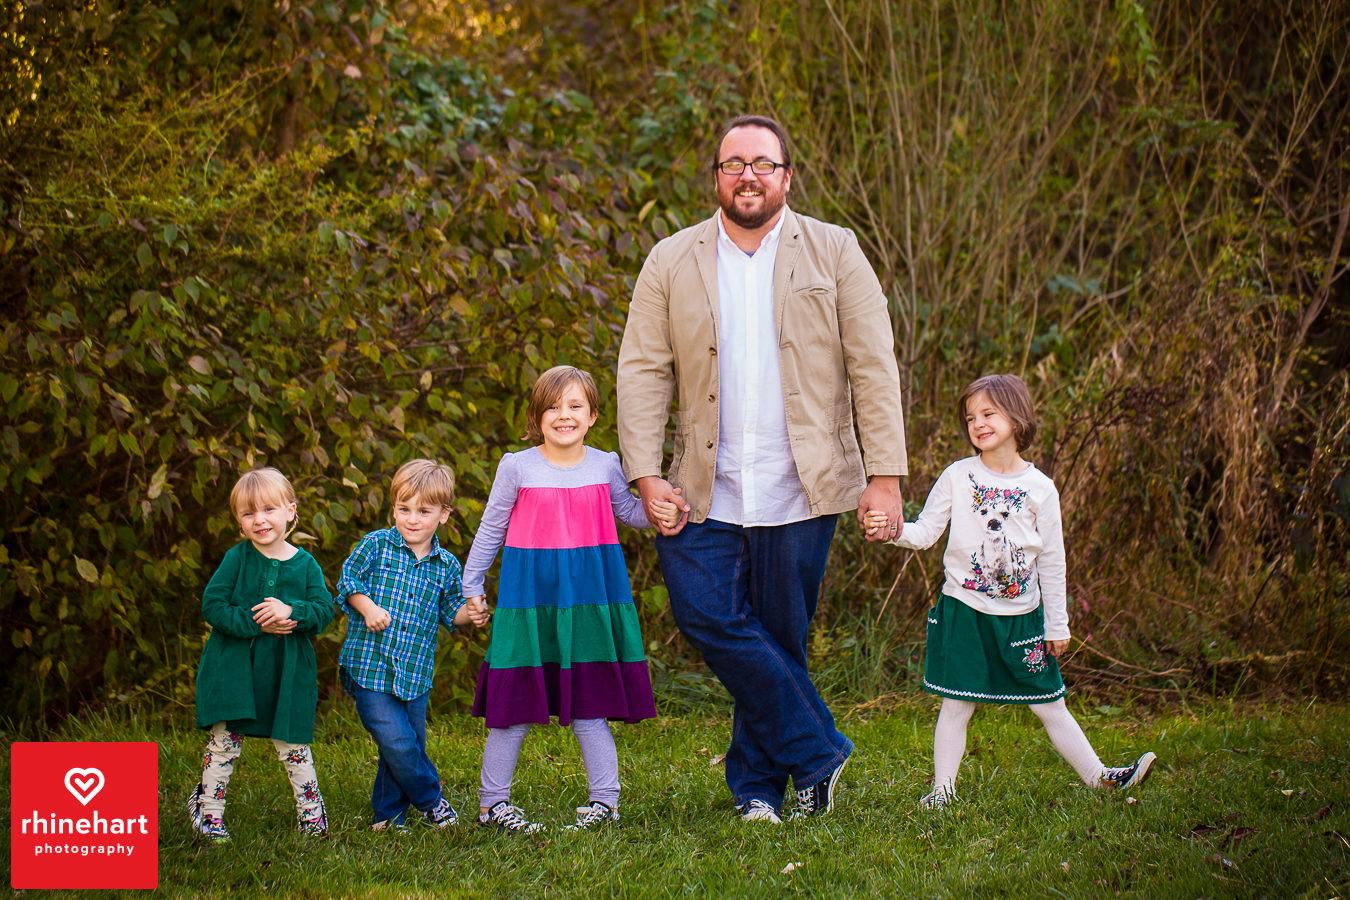 central-pa-pennsylvania-family-portrait-photographers-creative-unique-vibrant-colorful-19